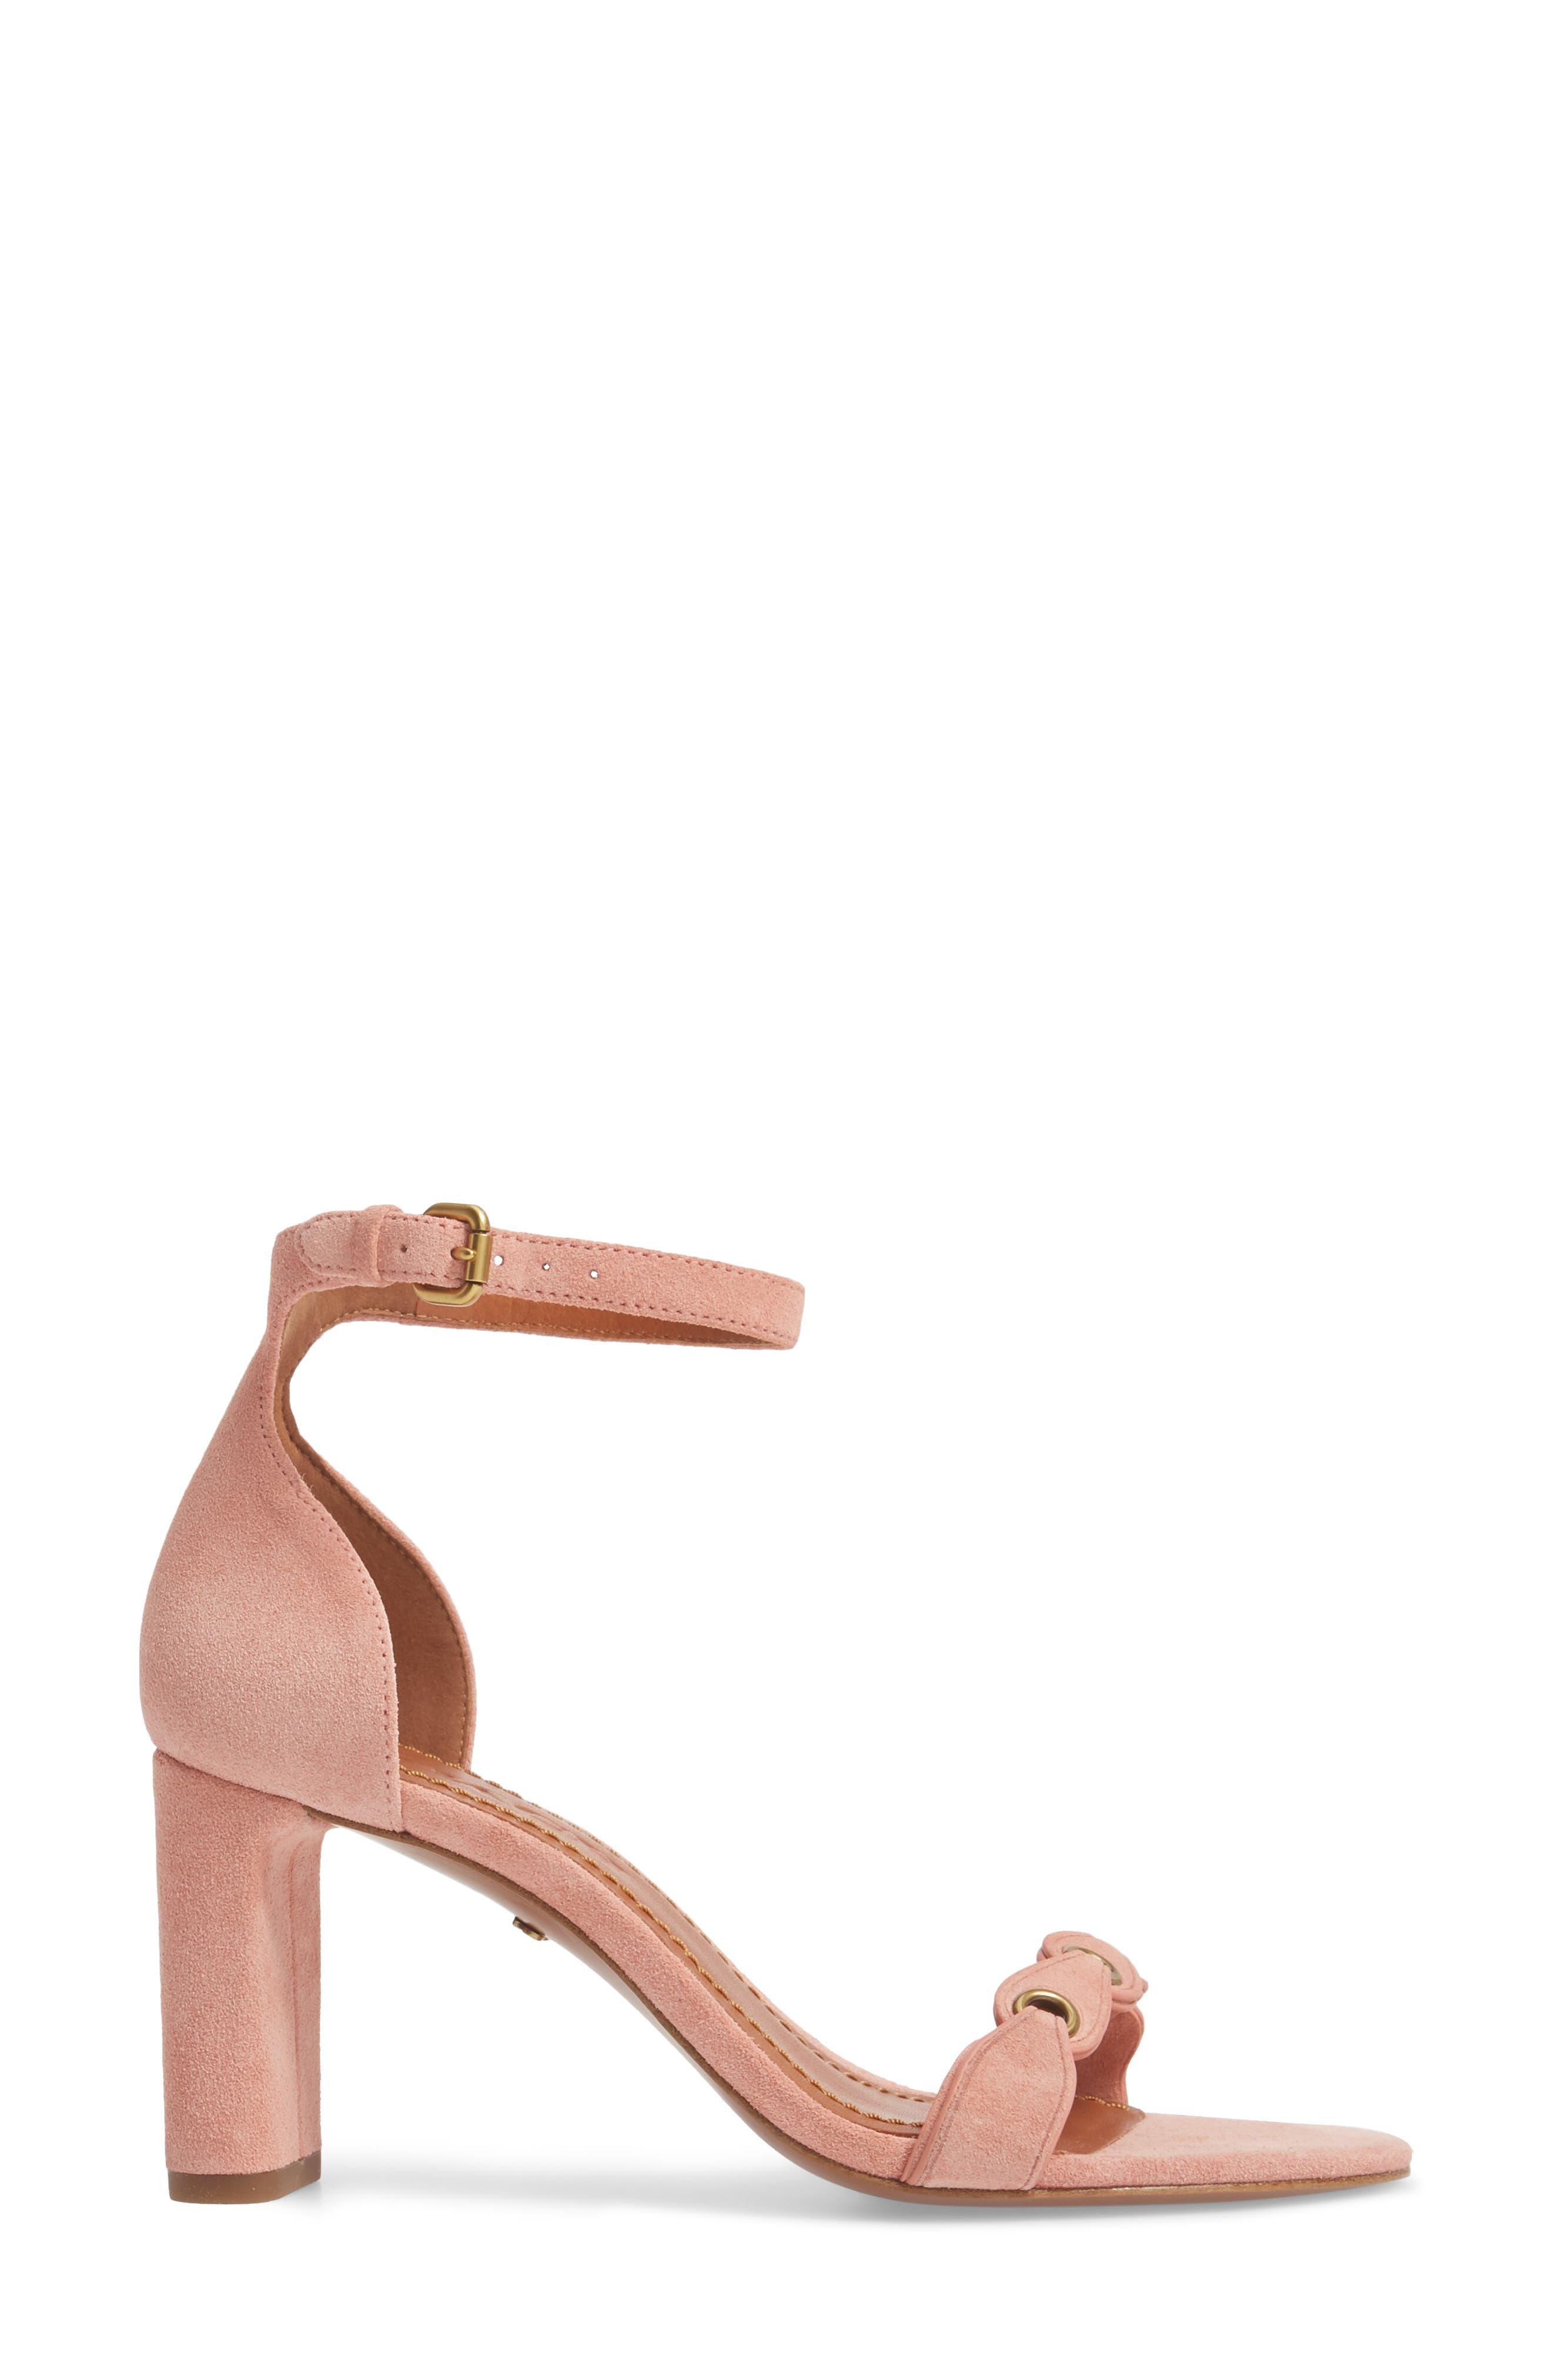 Link Strap Sandal,                             Alternate thumbnail 4, color,                             Peony Leather